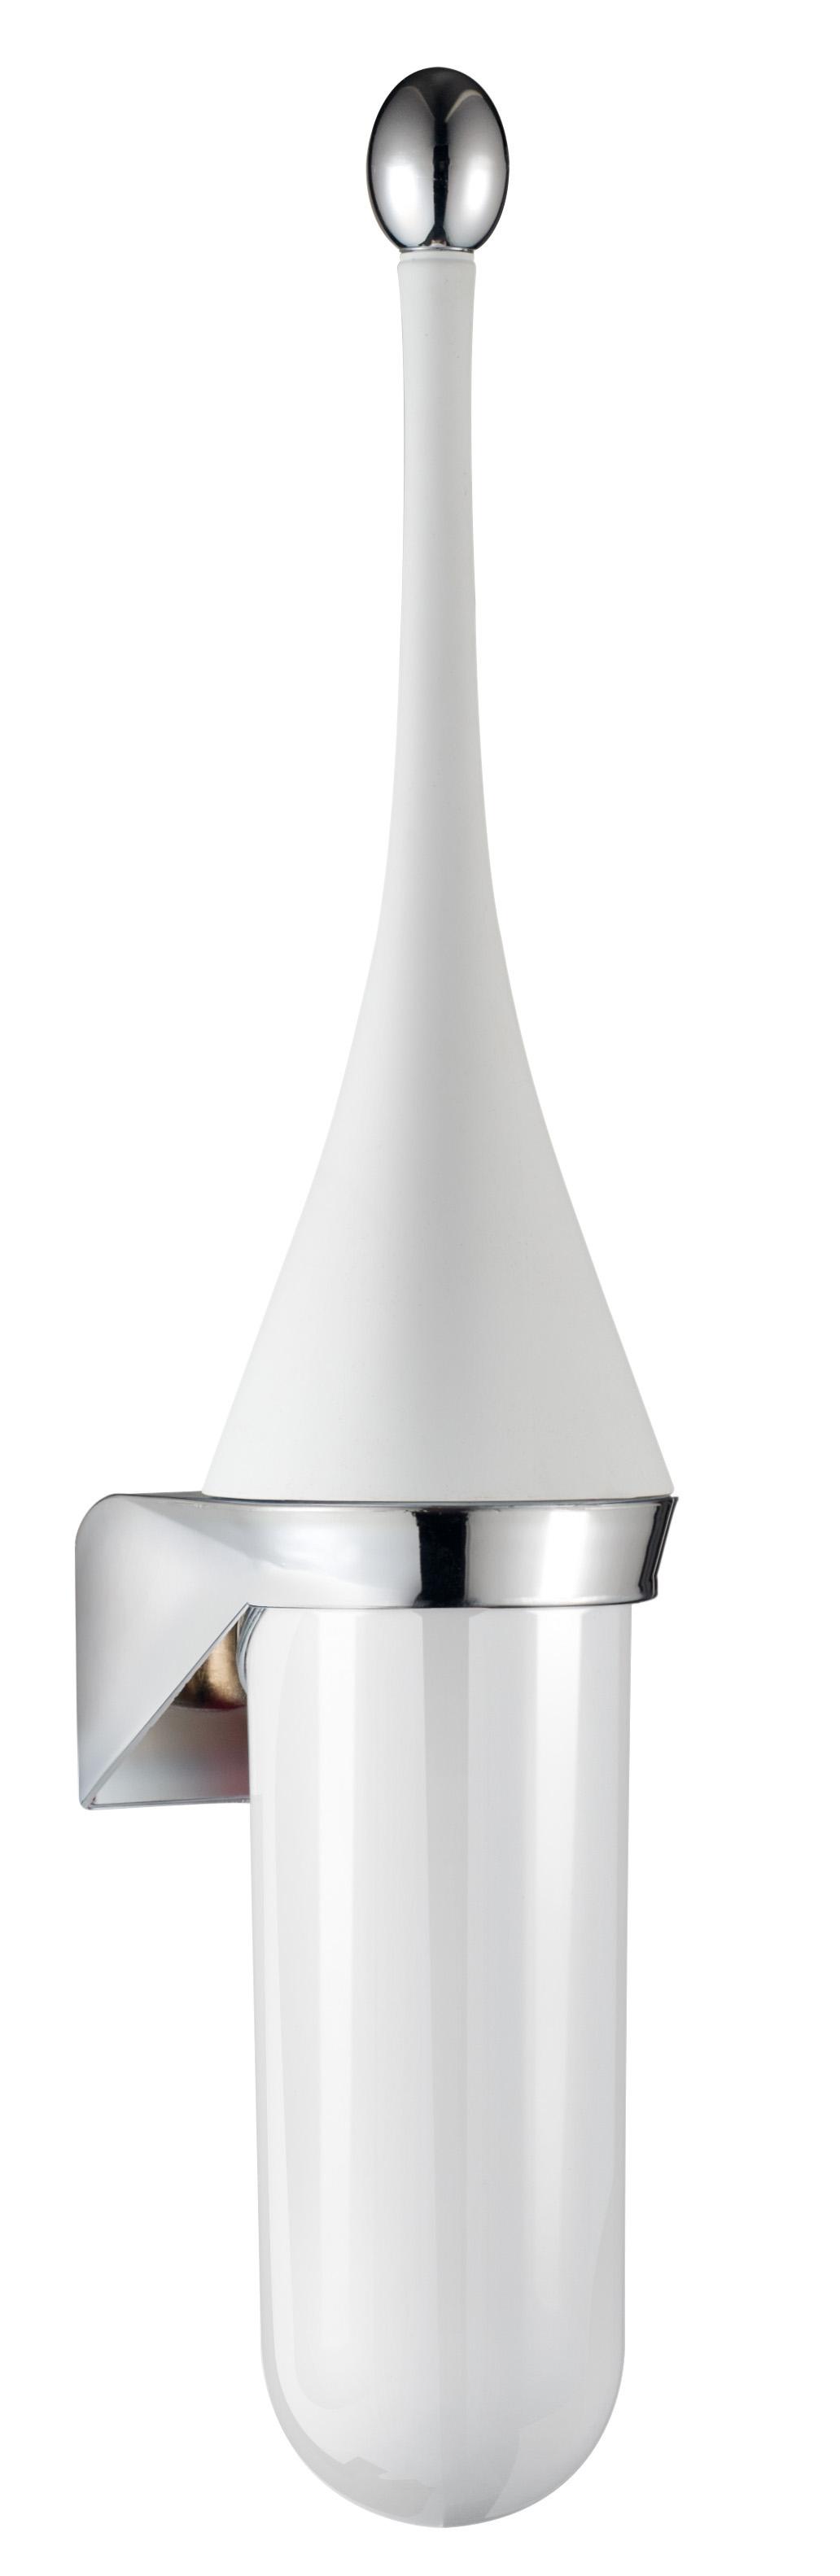 Marplast Soft Touch wc hari seinale, valge, kastis 6tk